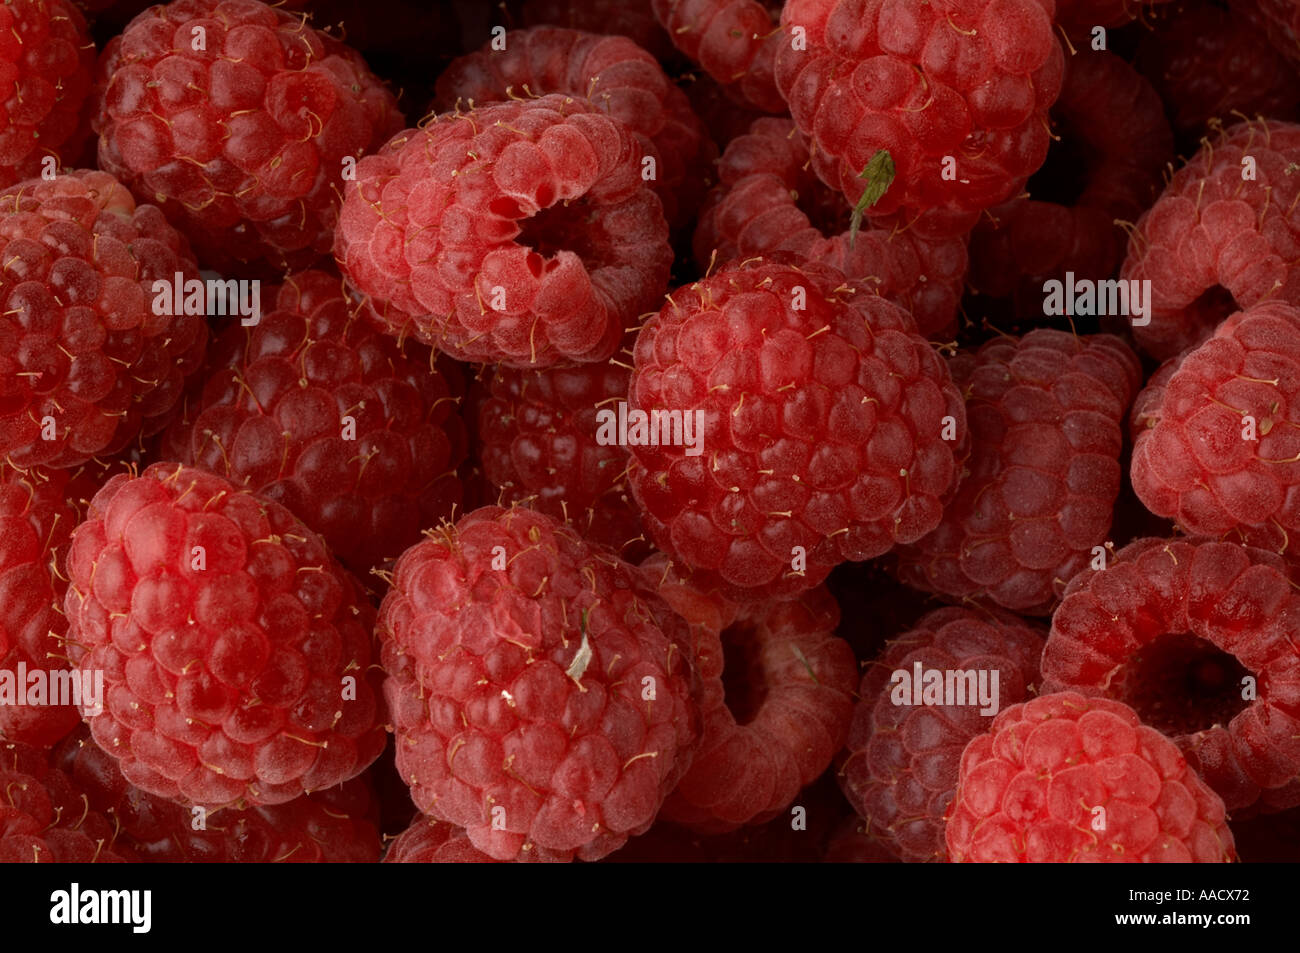 Rasberry Berry Berries Fruit Health Healthy Living Diet Vitamins Stock Photo 4110961 Alamy